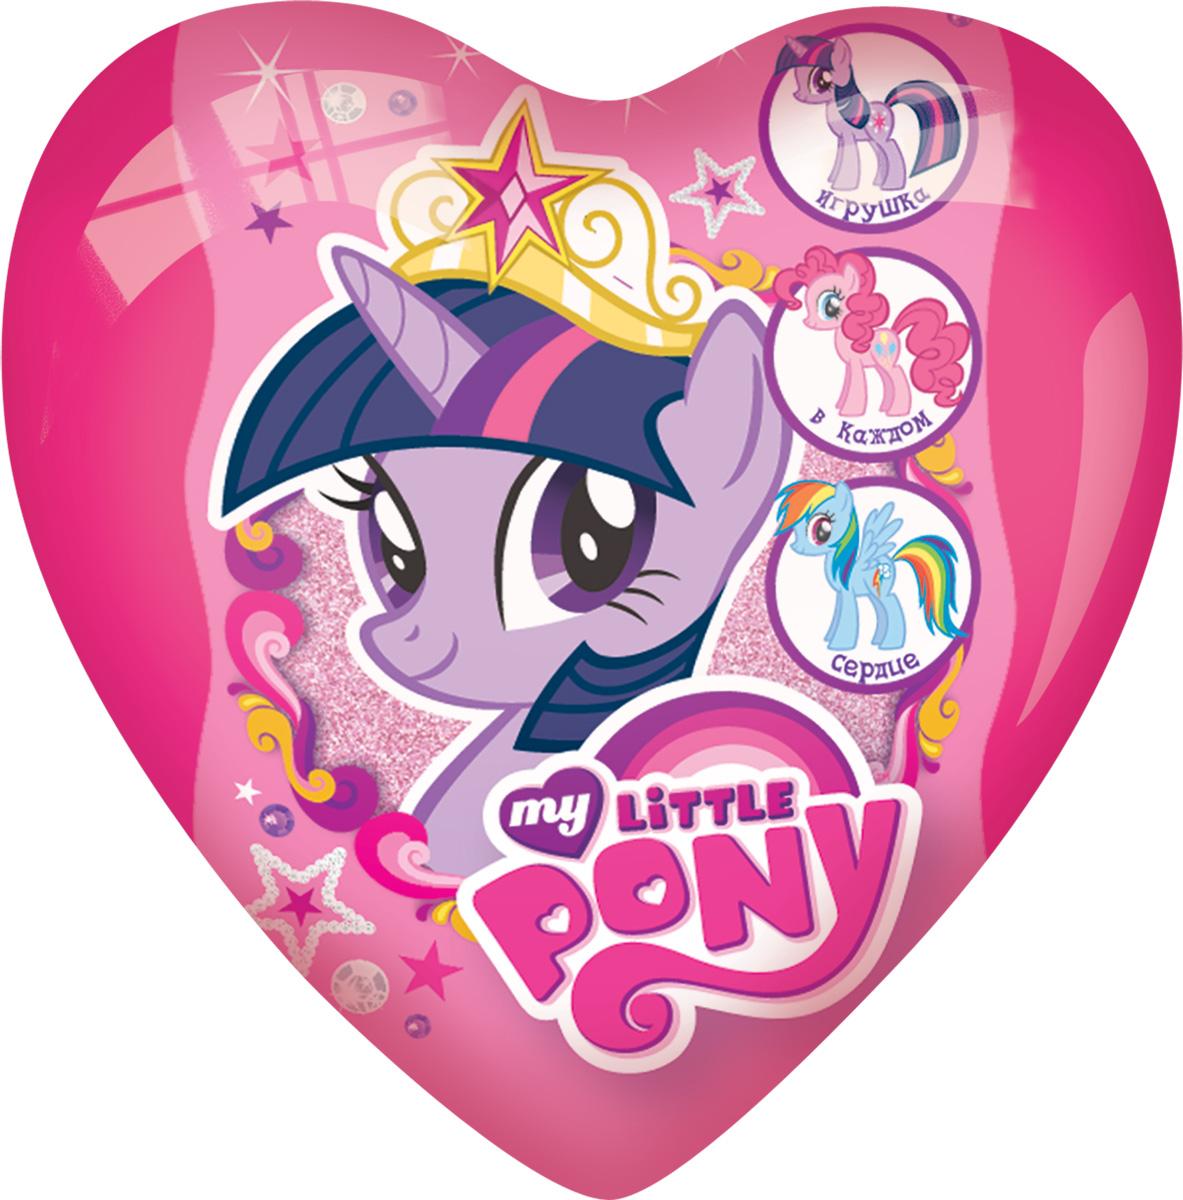 My Little Pony фруктовое драже с игрушкой, 20 г